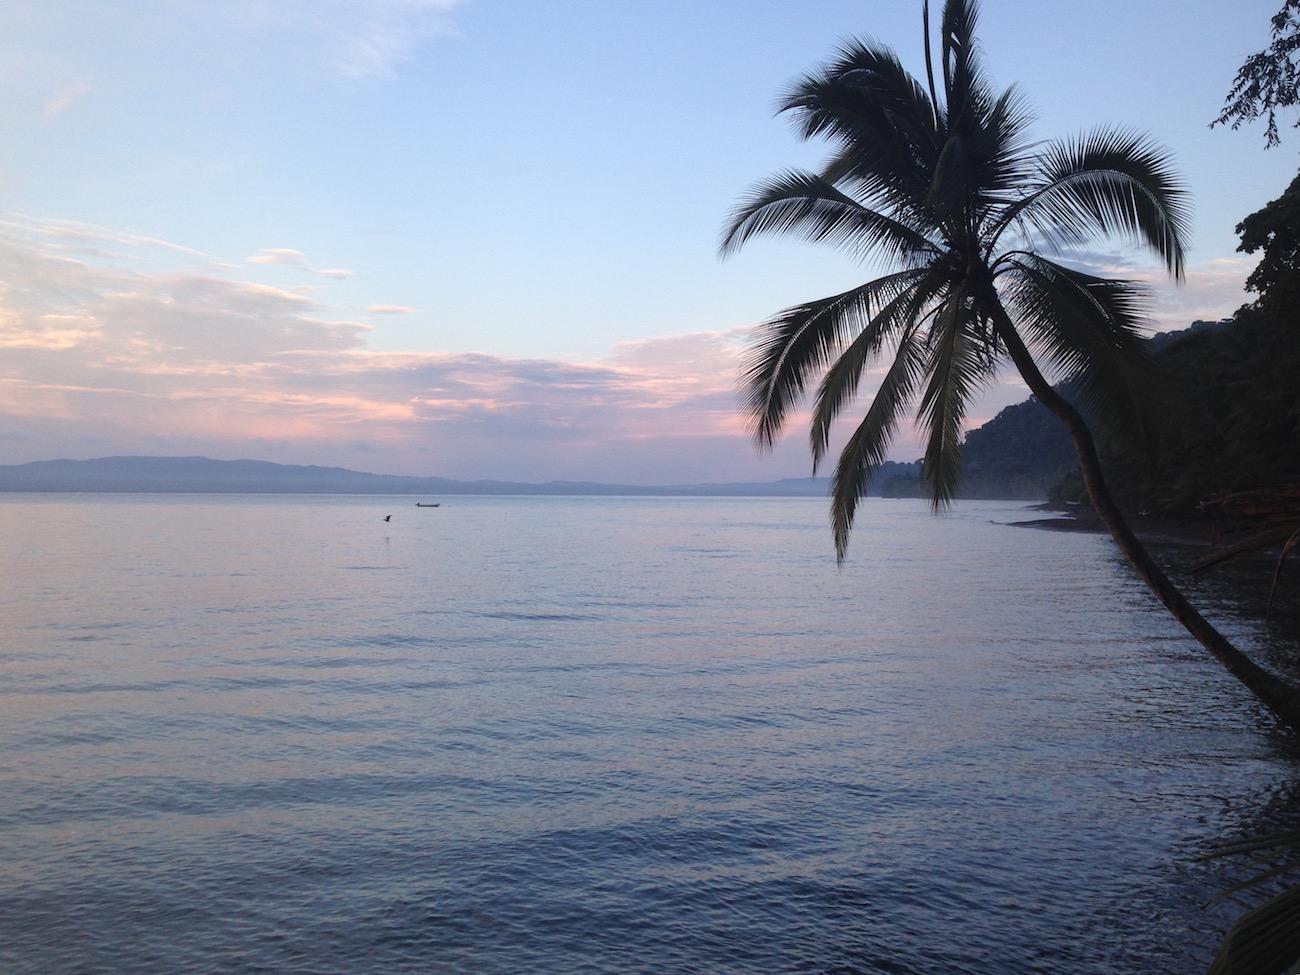 Dawn on Playa San Josecito